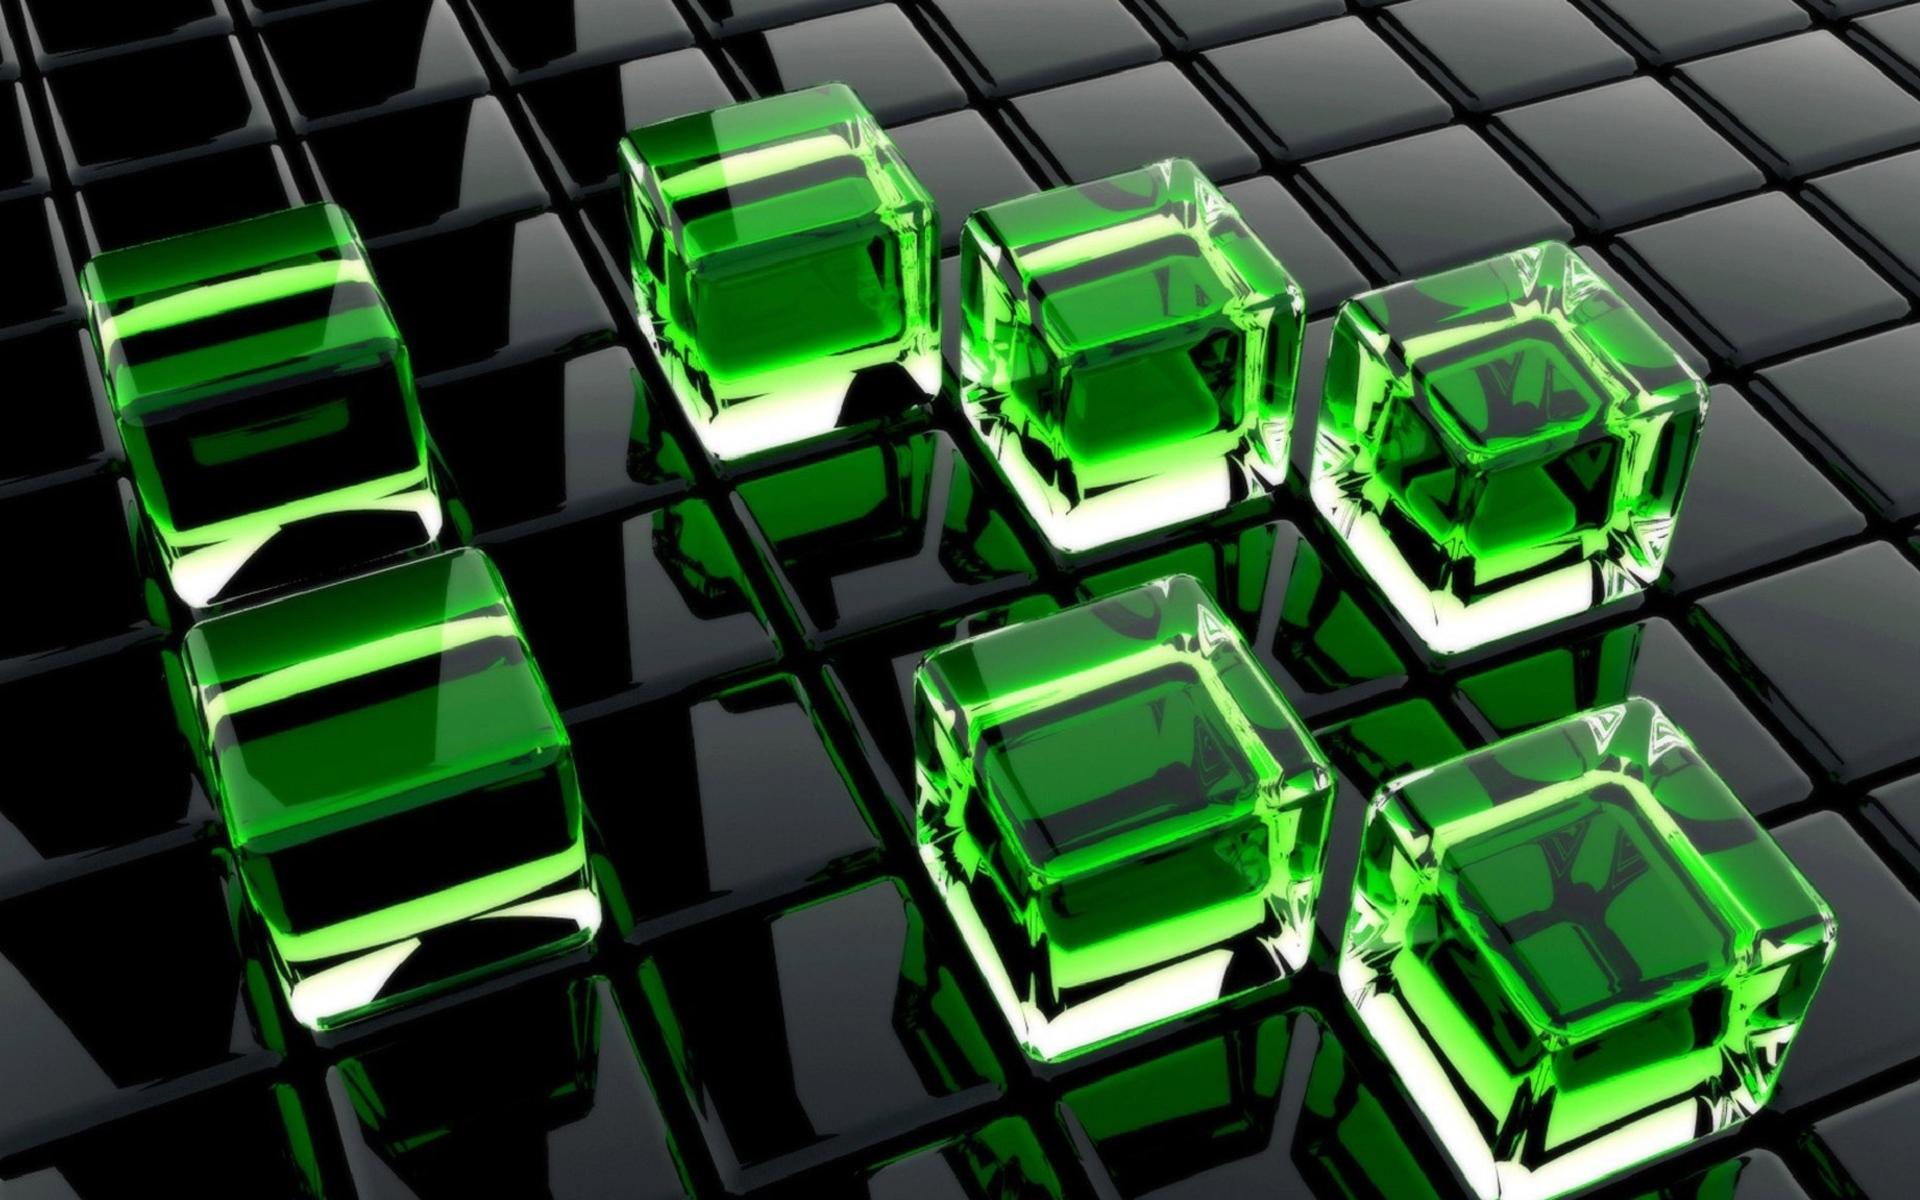 Download 3d cube wallpapers hd   Fullsize Wallpaper 1920x1200